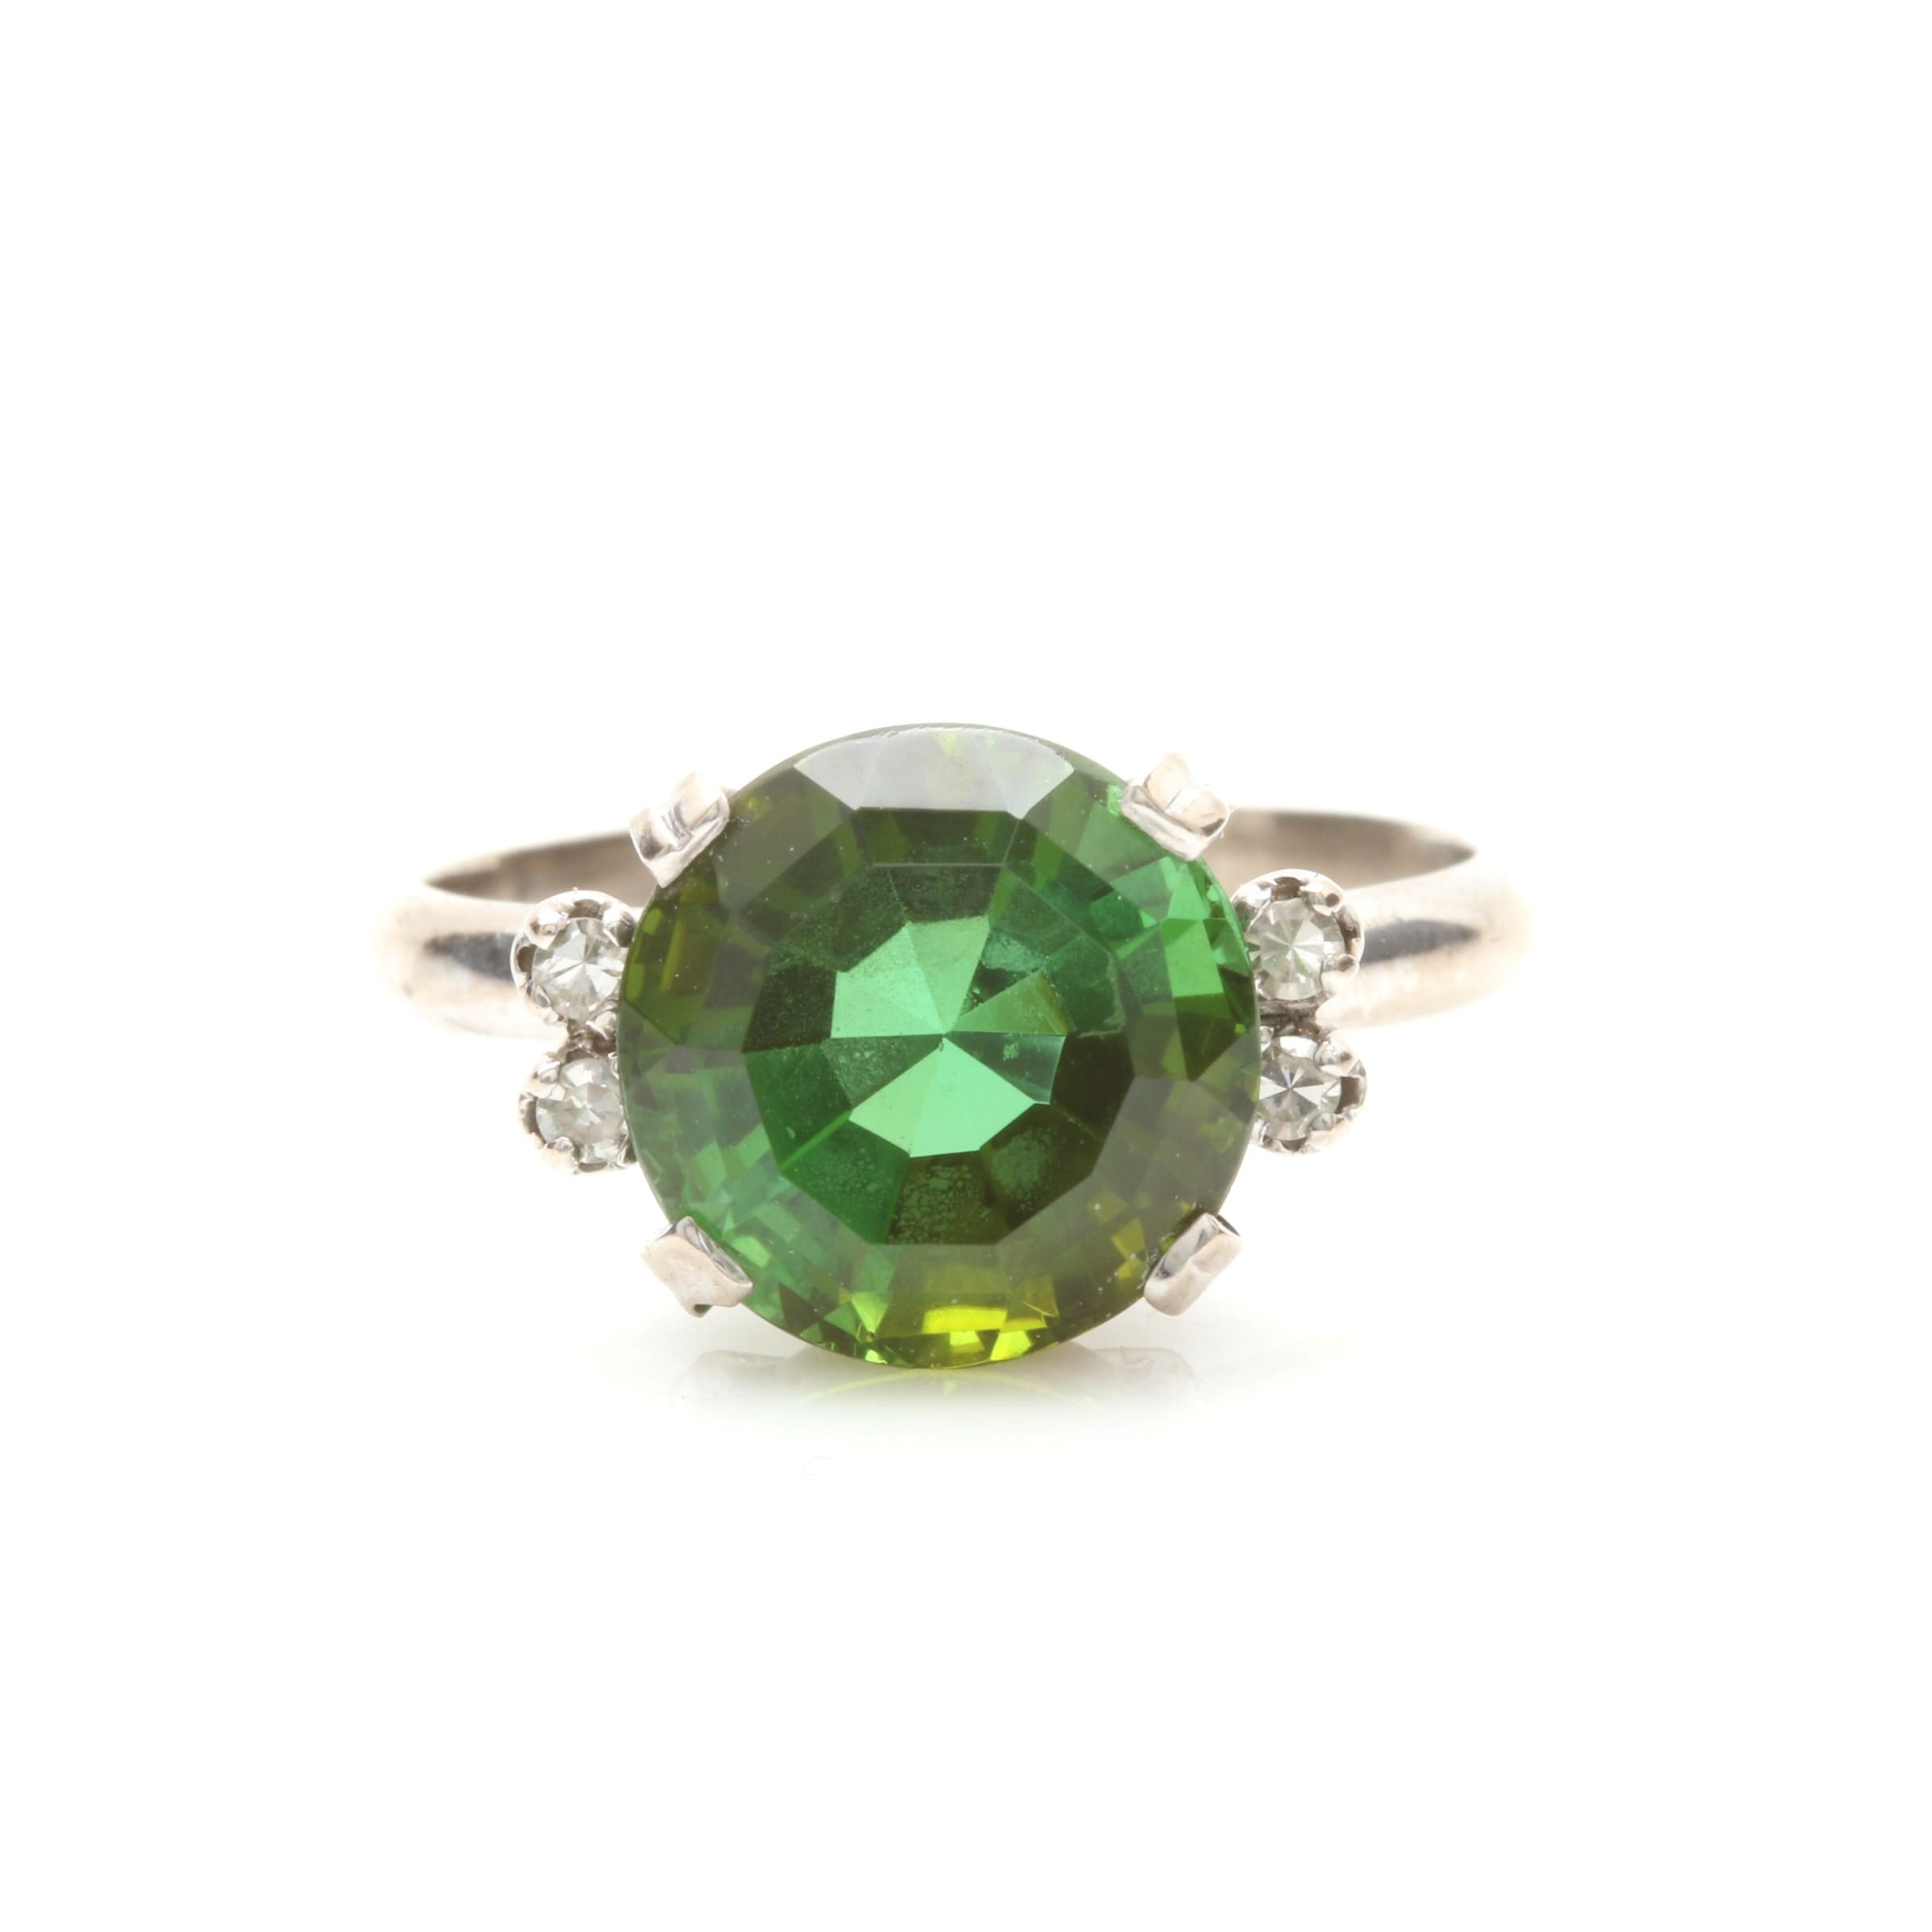 14K and 18K White Gold 4.11 CT Green Tourmaline and Diamond Ring